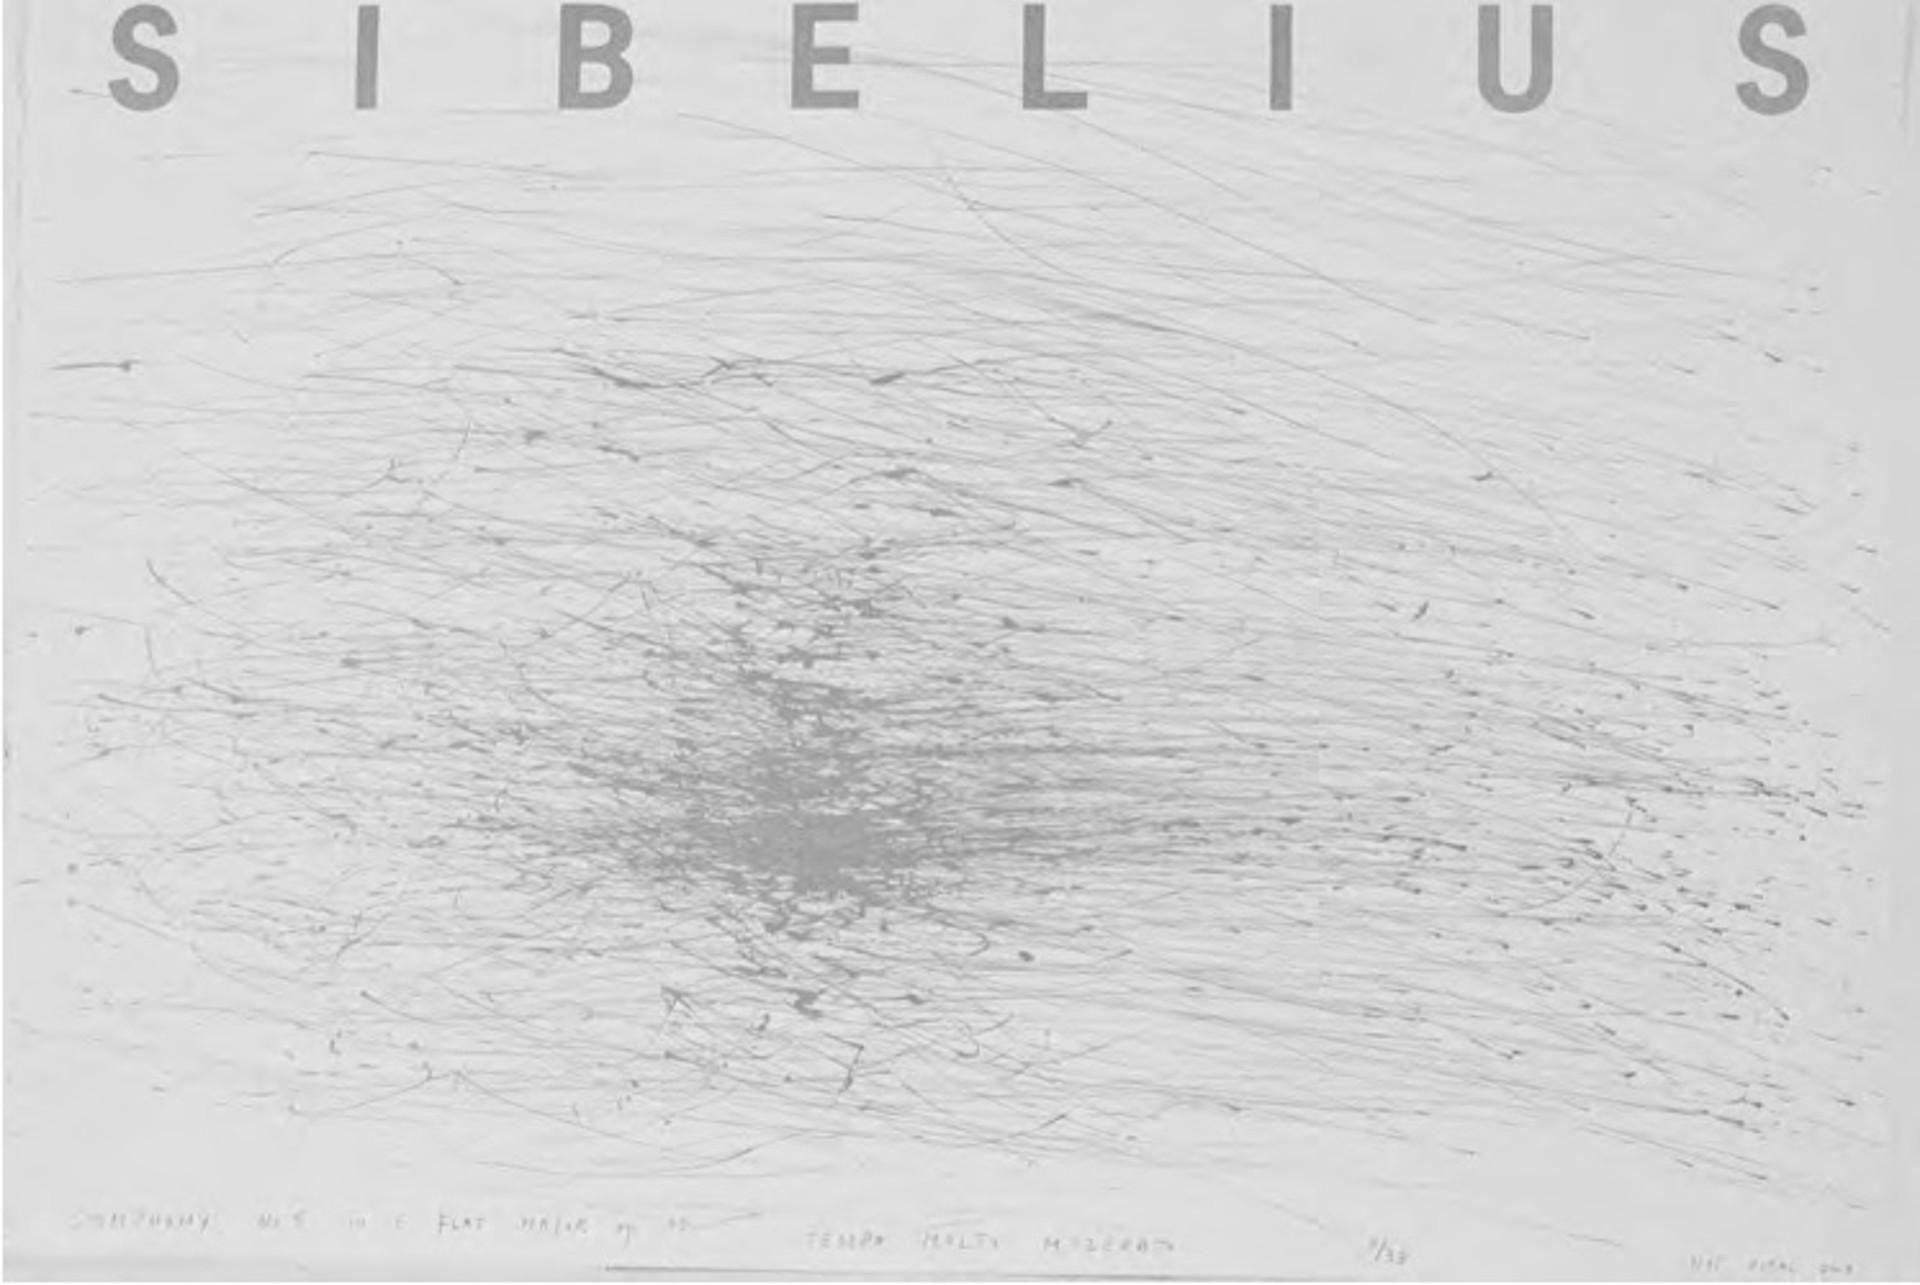 Sibelius, Symphony No. 5 in E flat major, Opus 82, Tempo molto moderato by Not Vital